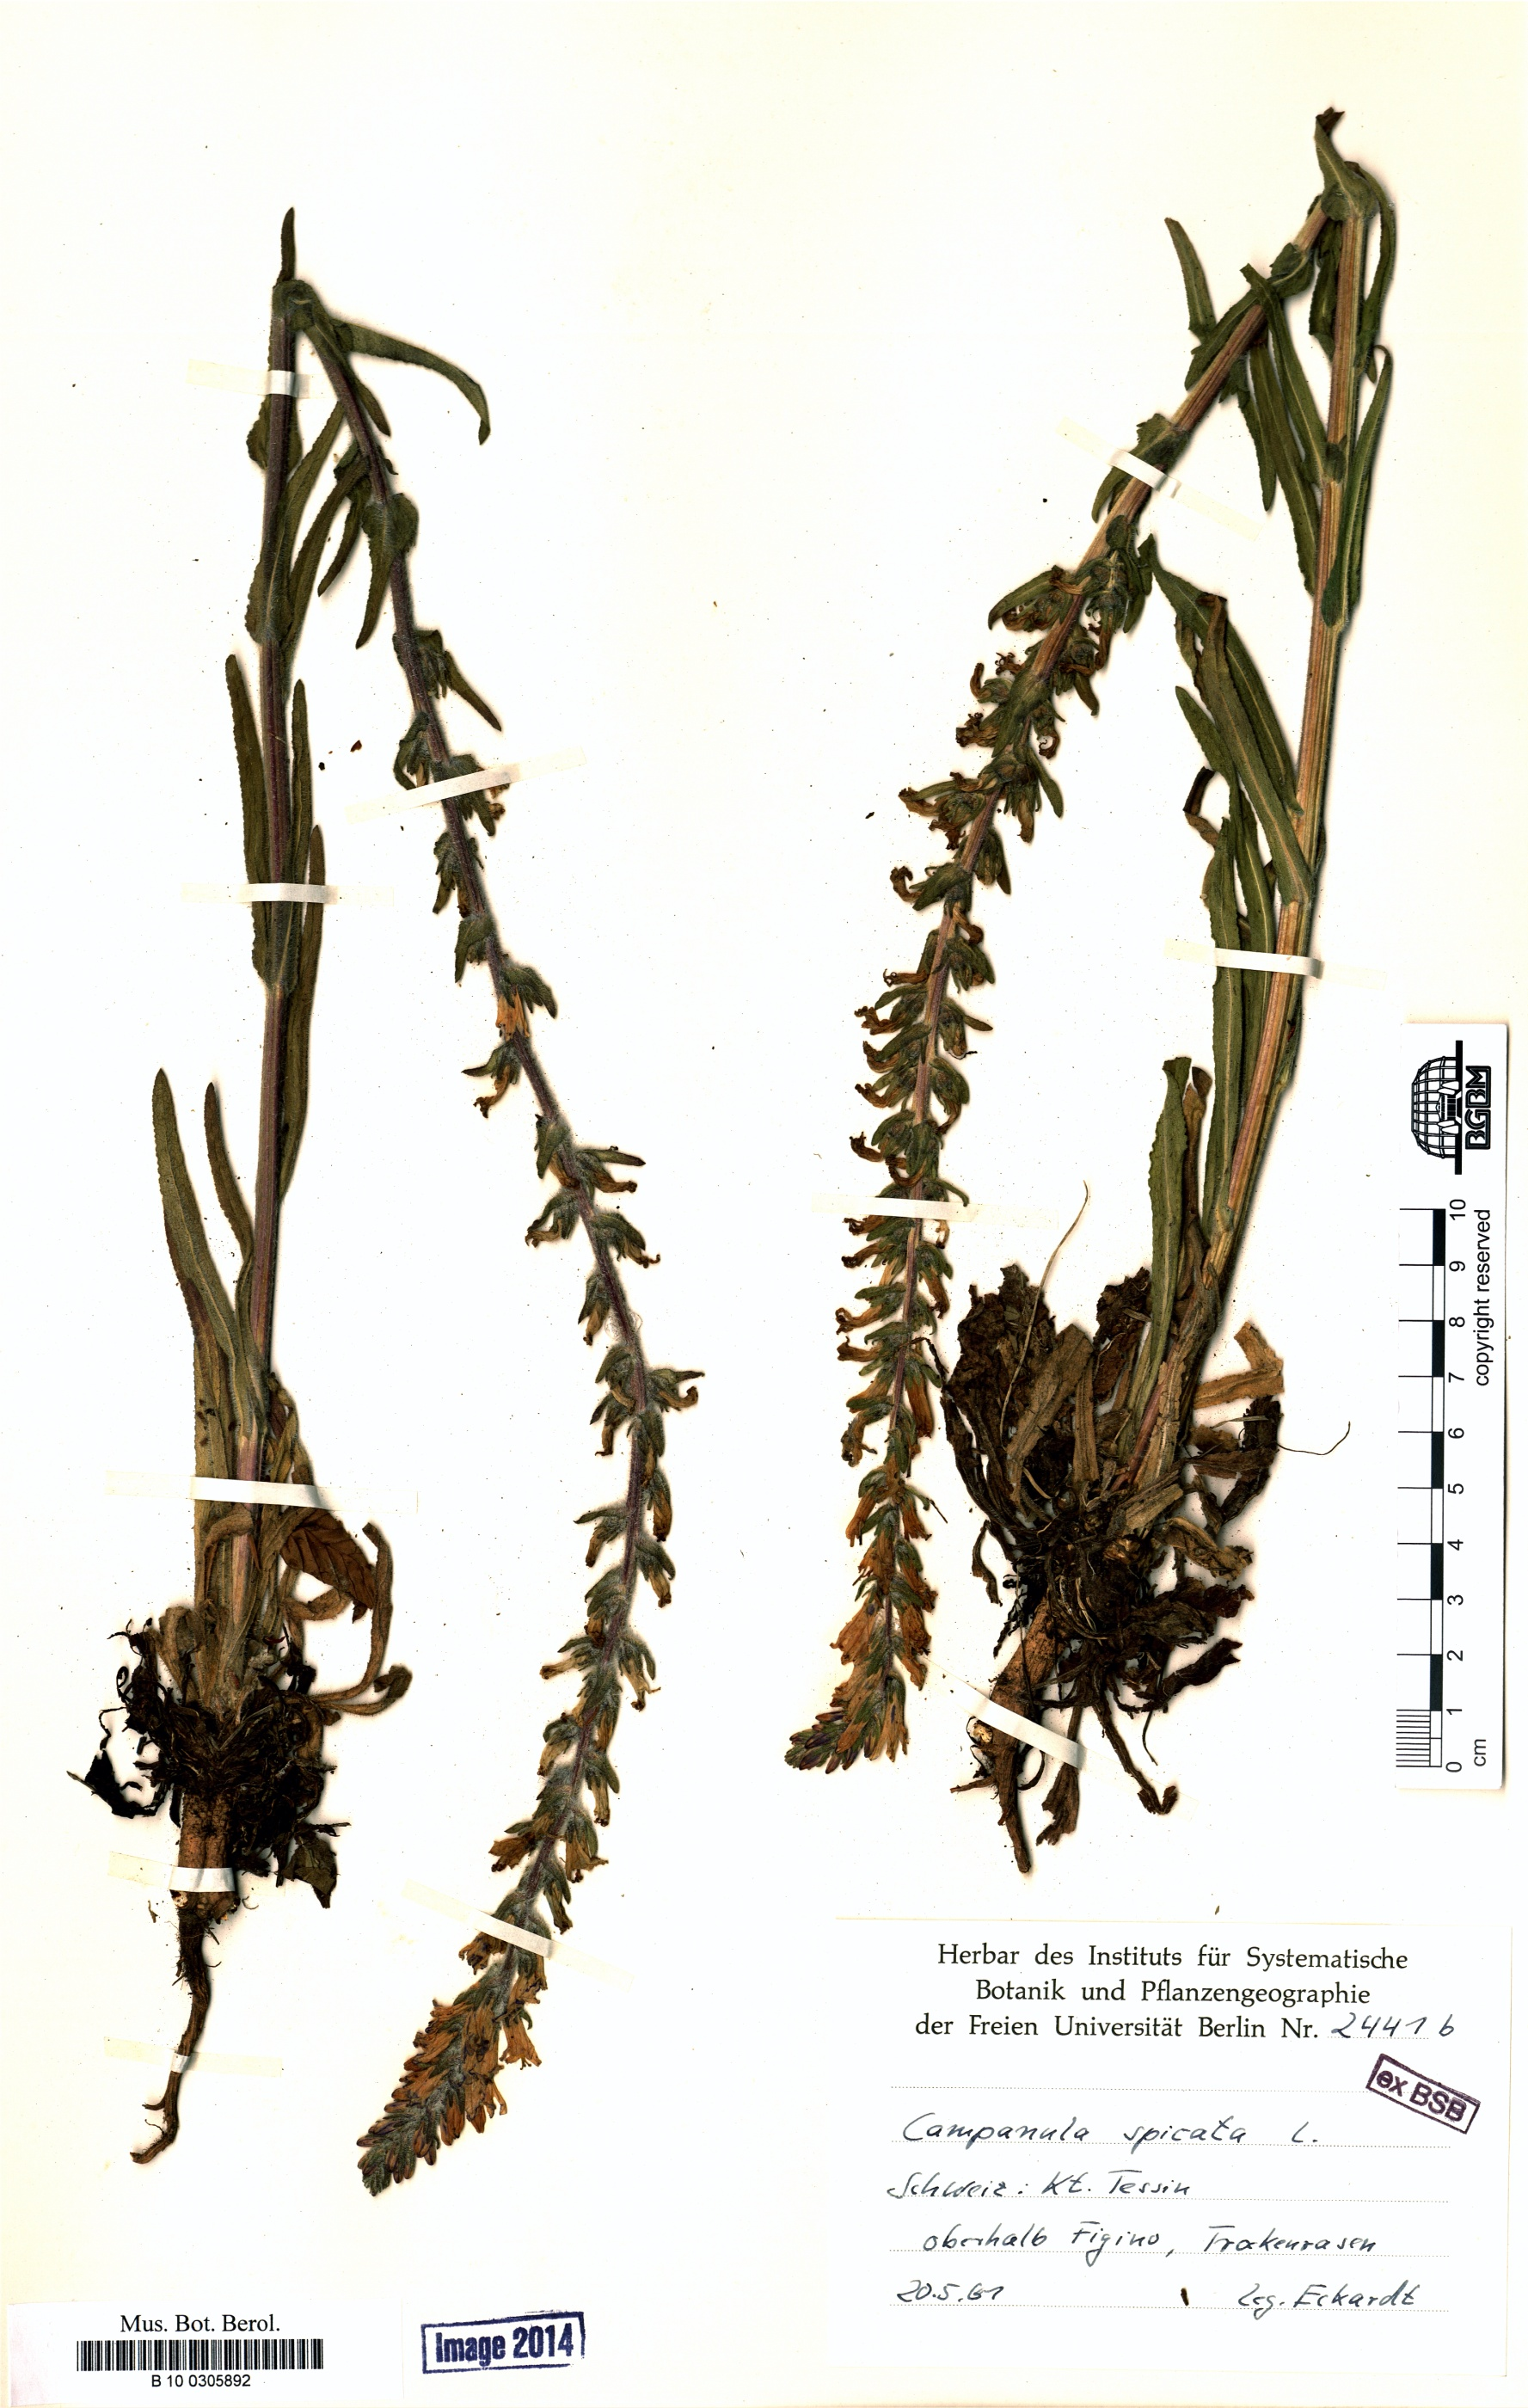 http://ww2.bgbm.org/herbarium/images/B/10/03/05/89/B_10_0305892.jpg